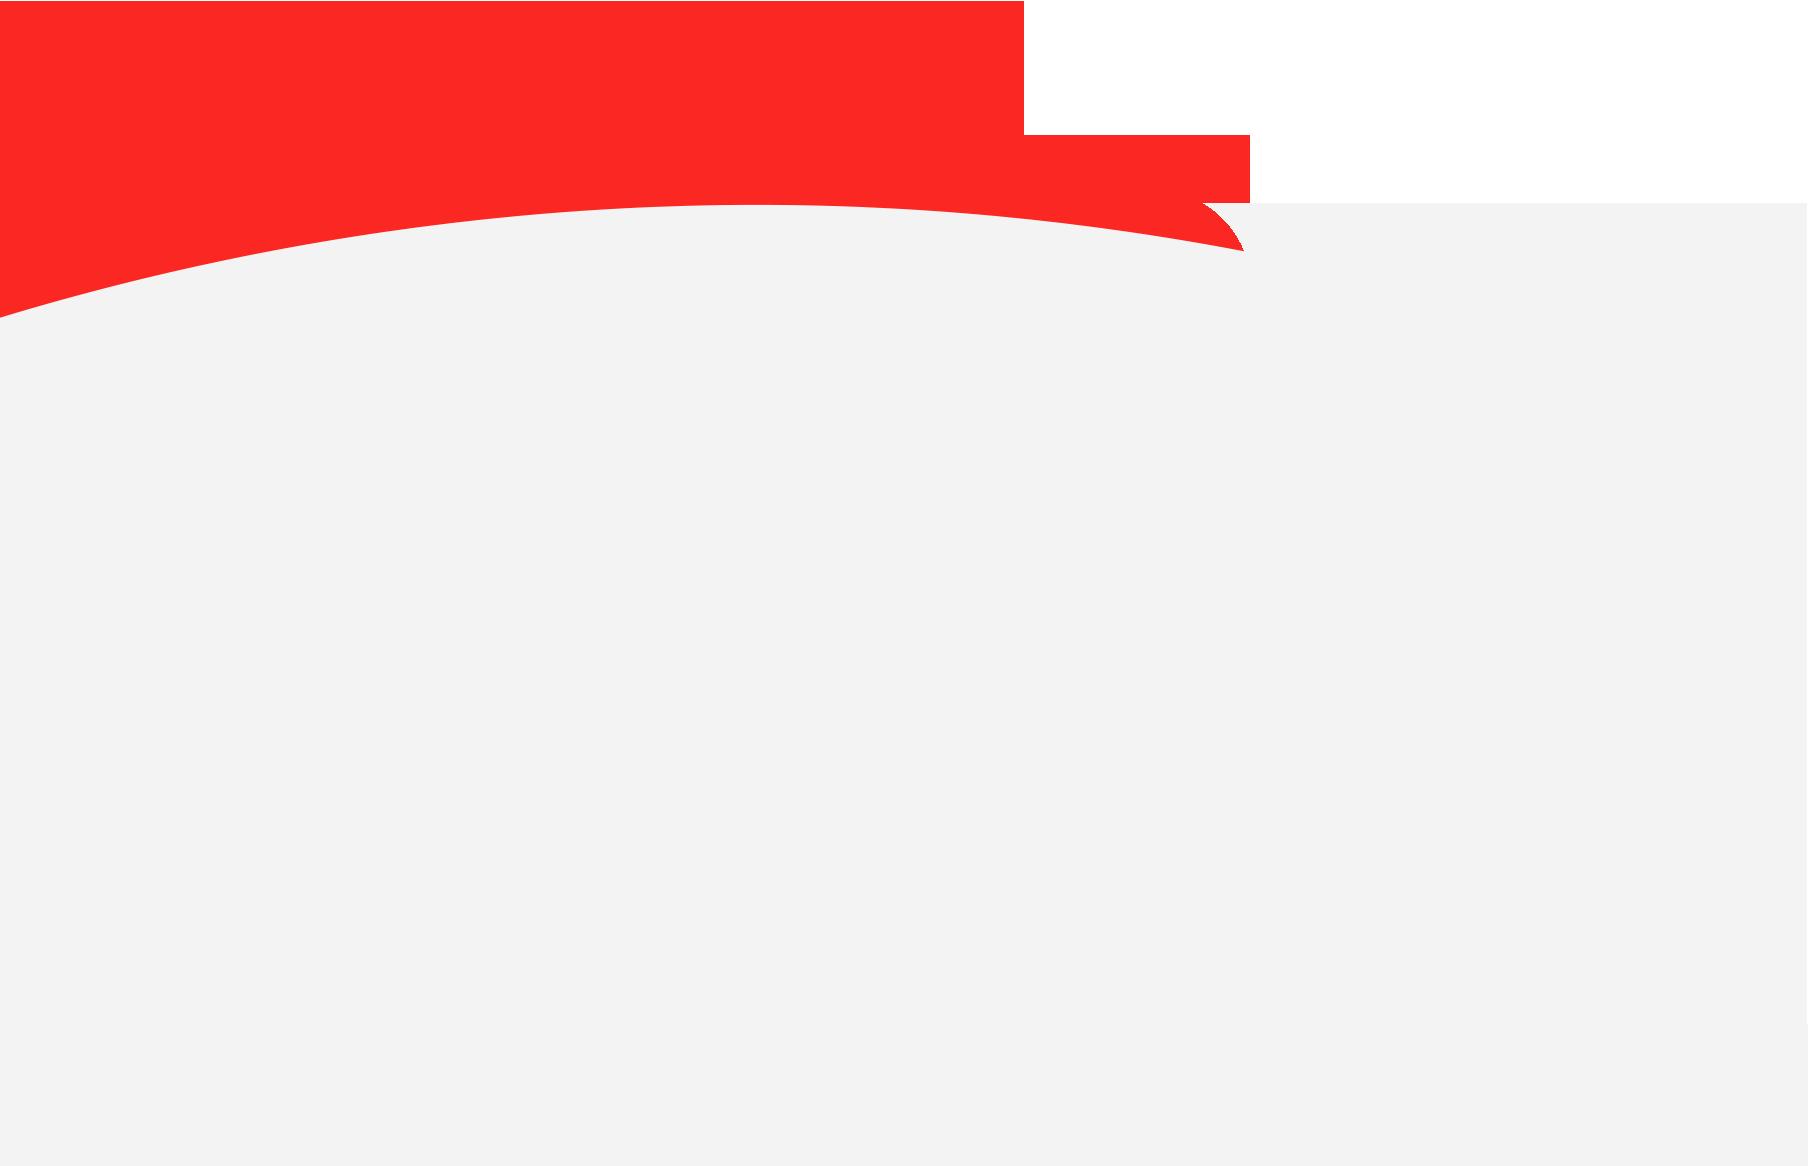 BG-rojo2